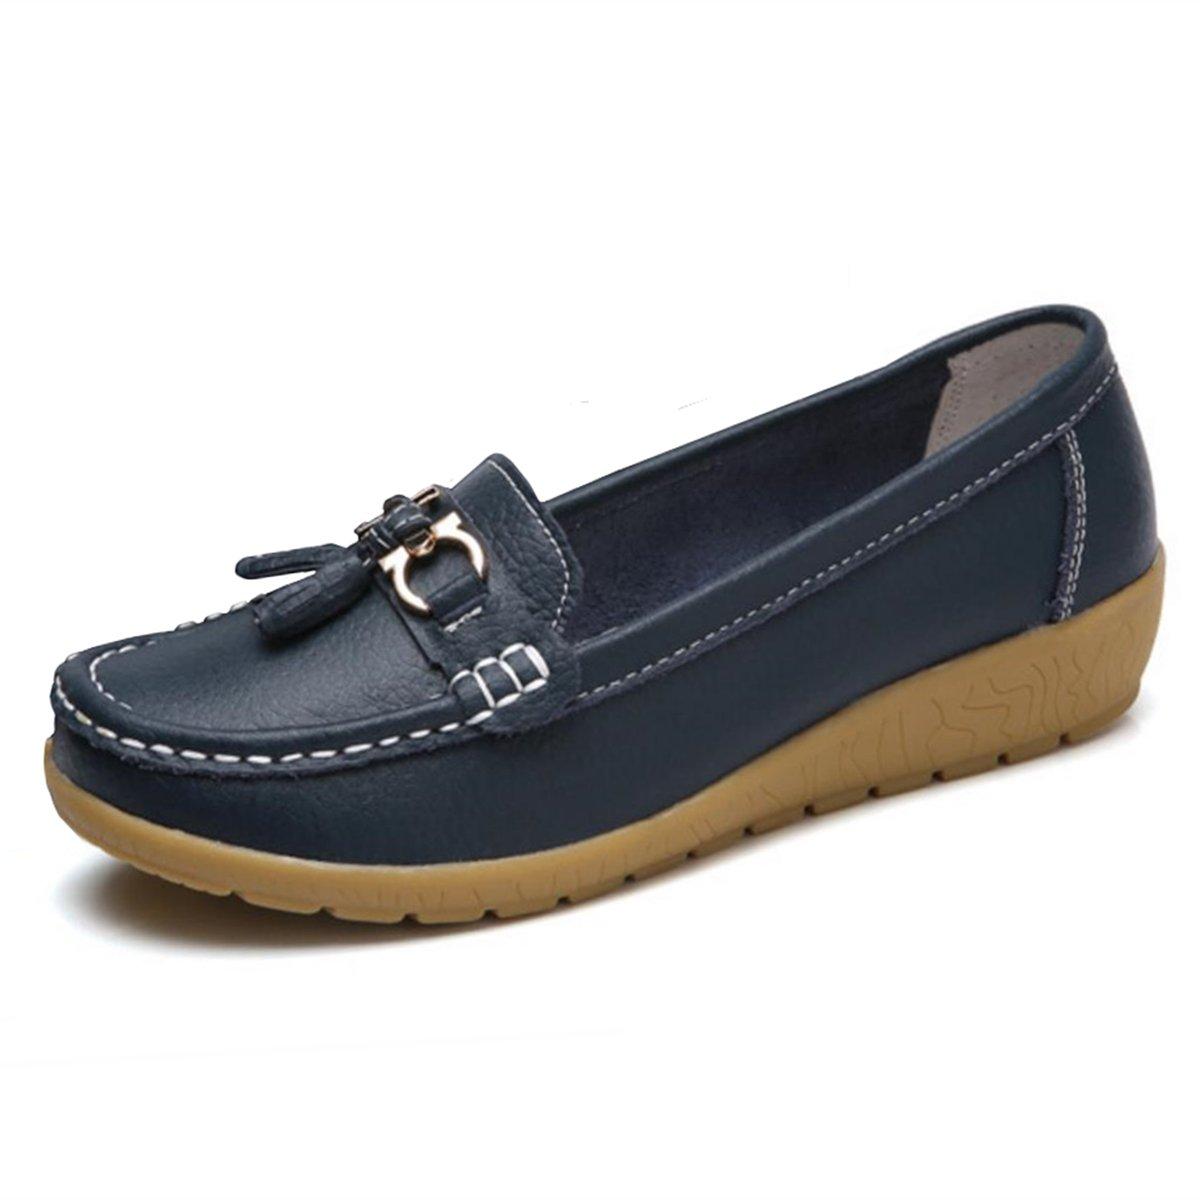 Women Loafers Leather Oxford Slip On Walking Flats Anti-Skid Boat Shoes (7.5 B (M) US, V-Dark Blue)